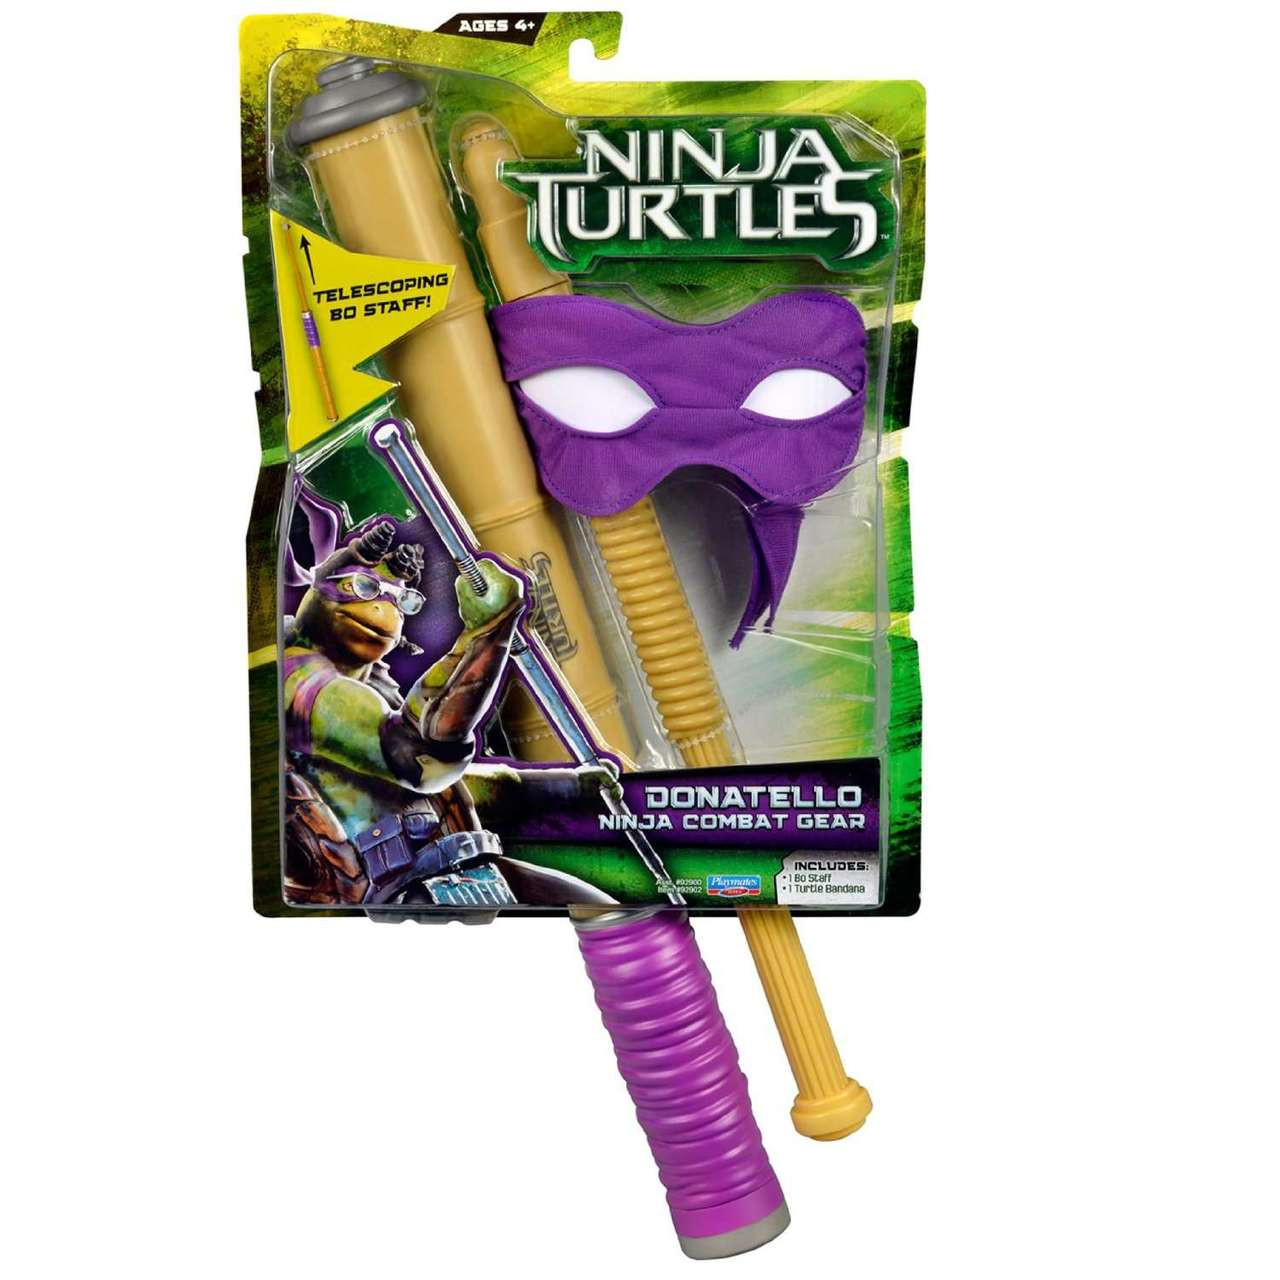 Teenage Mutant Ninja Turtles 2014 Movie Donatello Ninja Combat Gear  Roleplay Toy